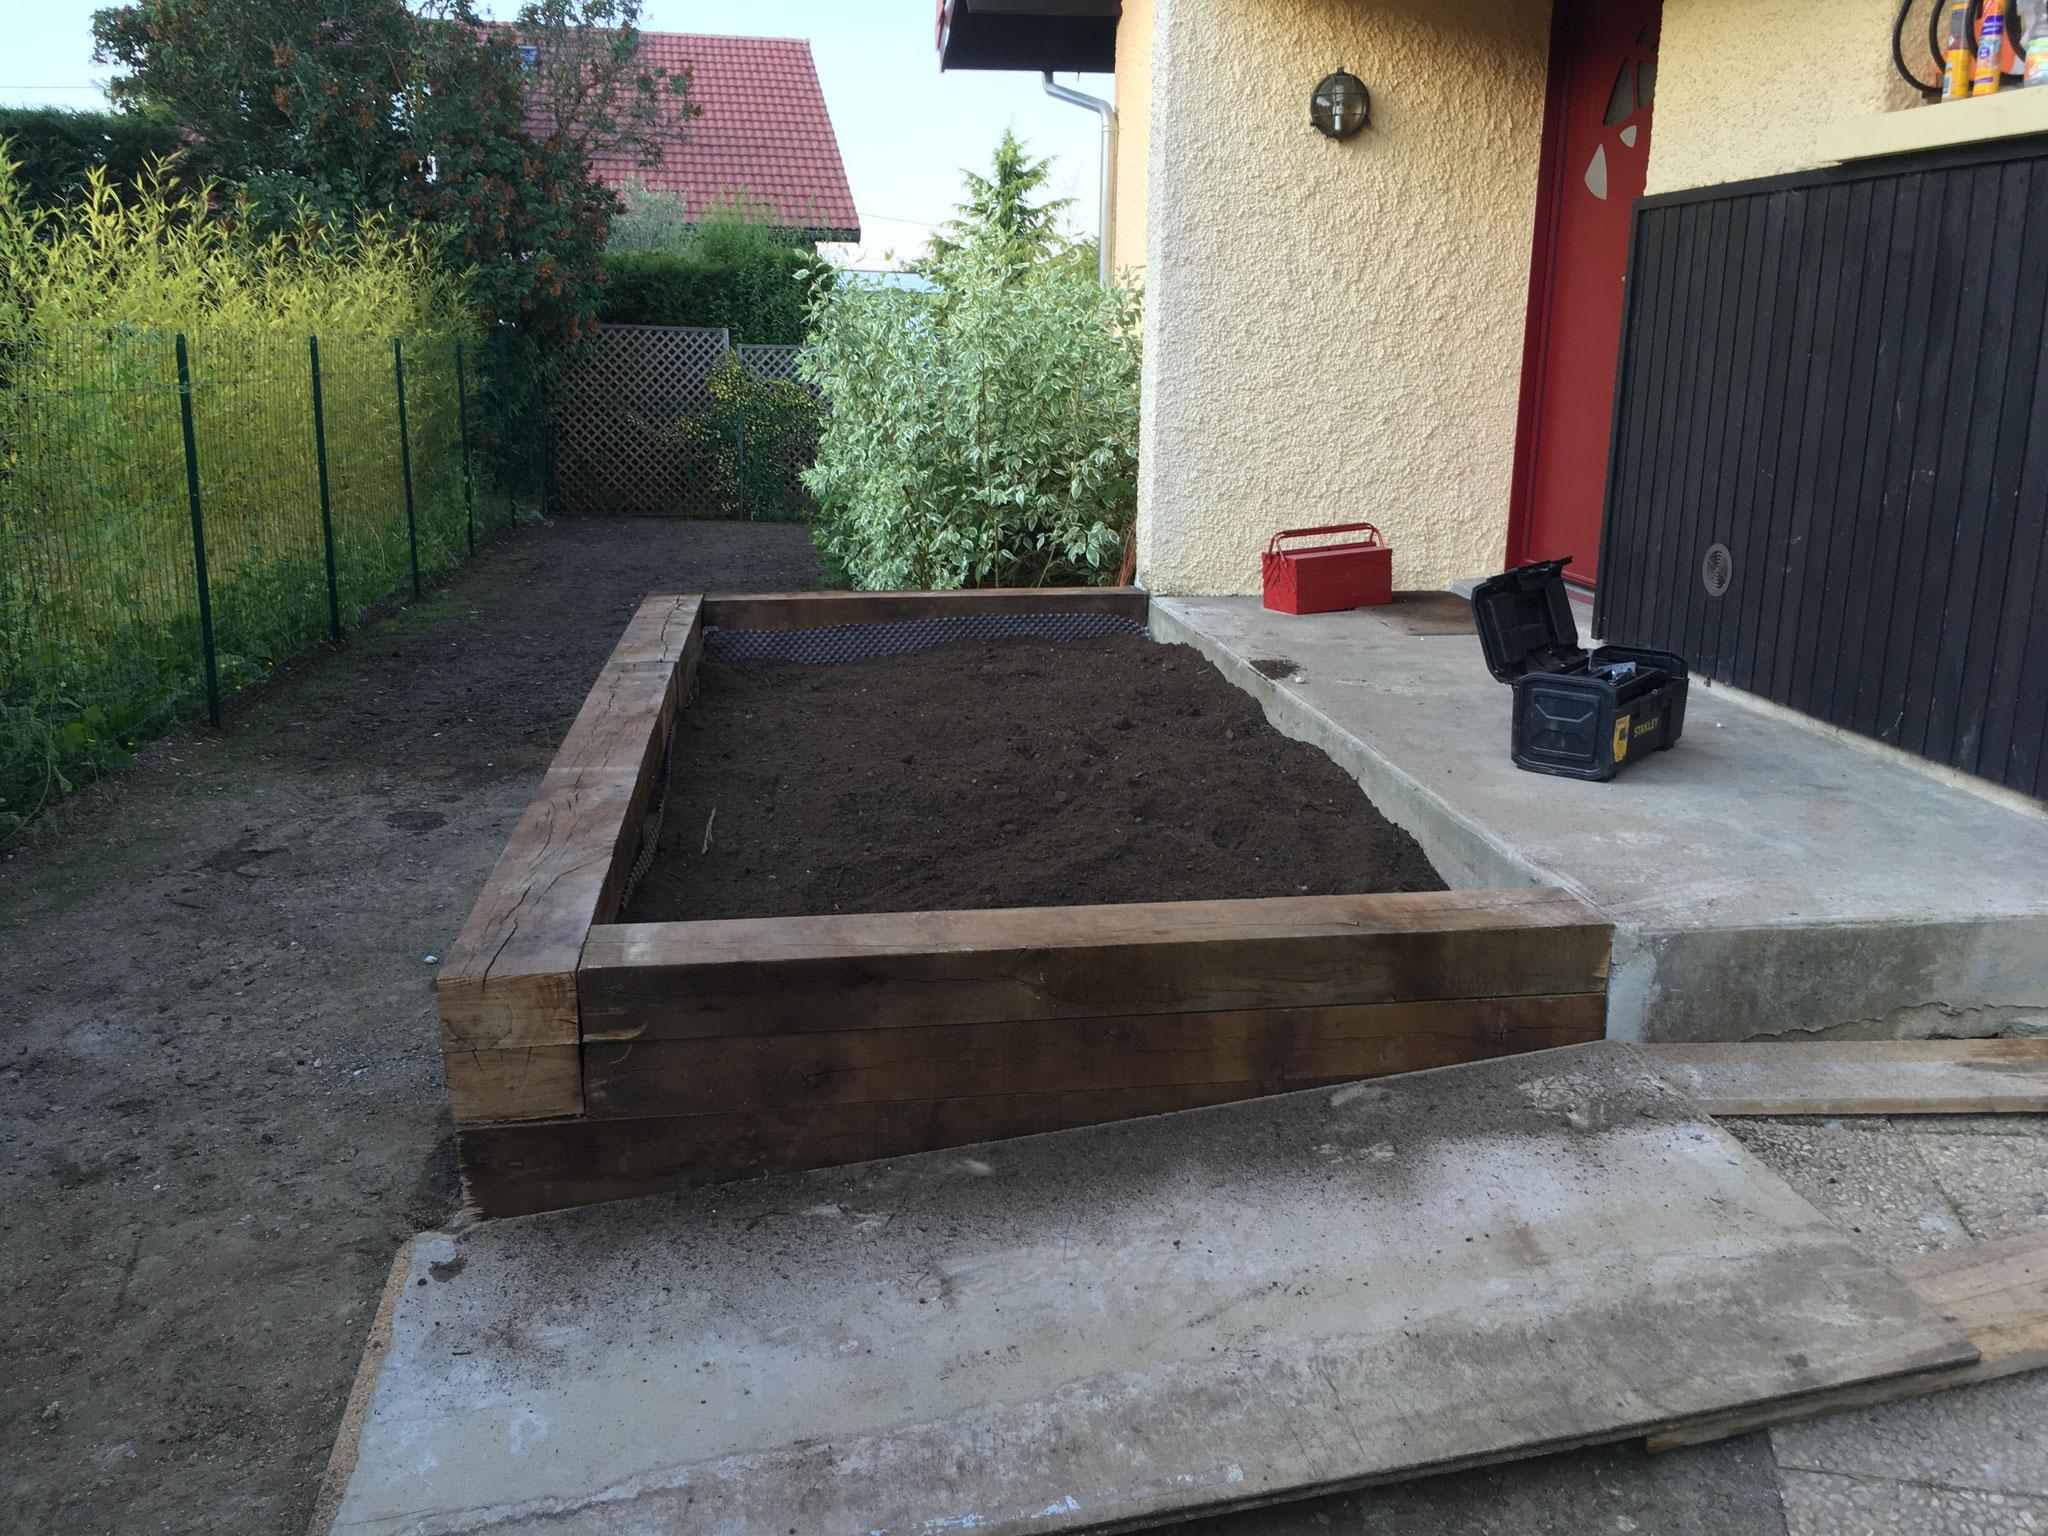 Apport de terre vegetale amendée